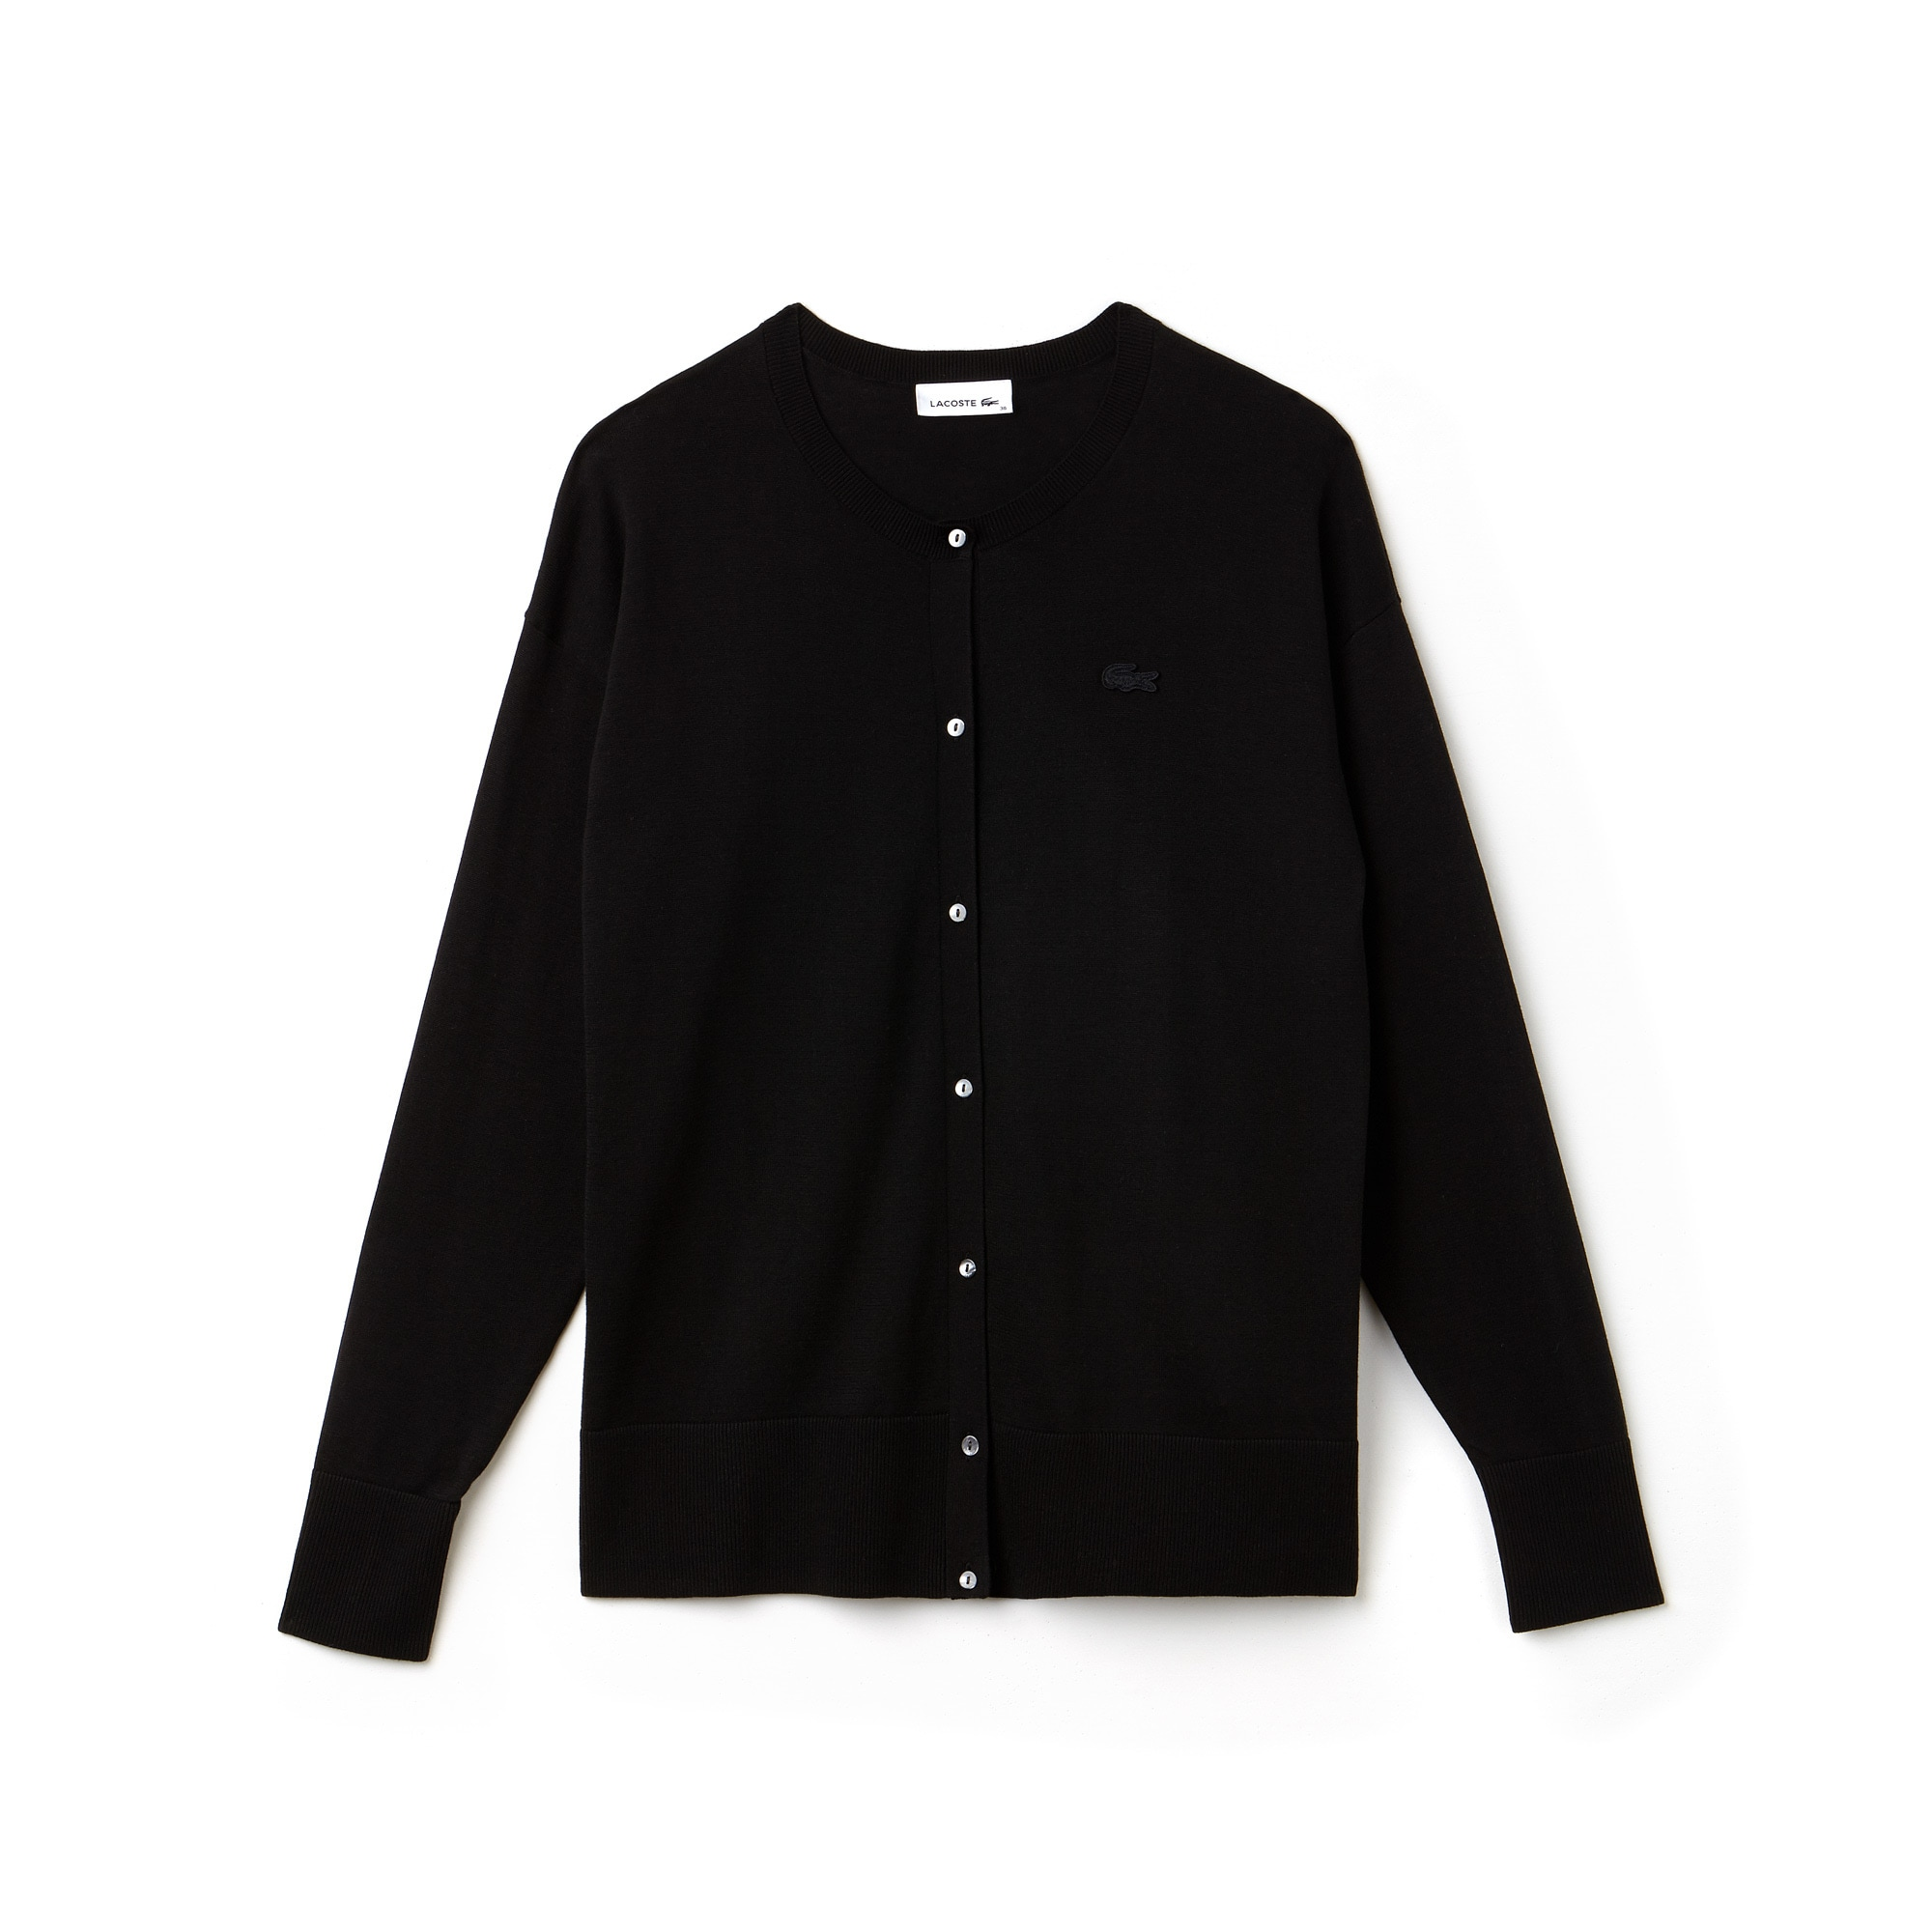 Women's High Neck Cotton Jersey Cardigan